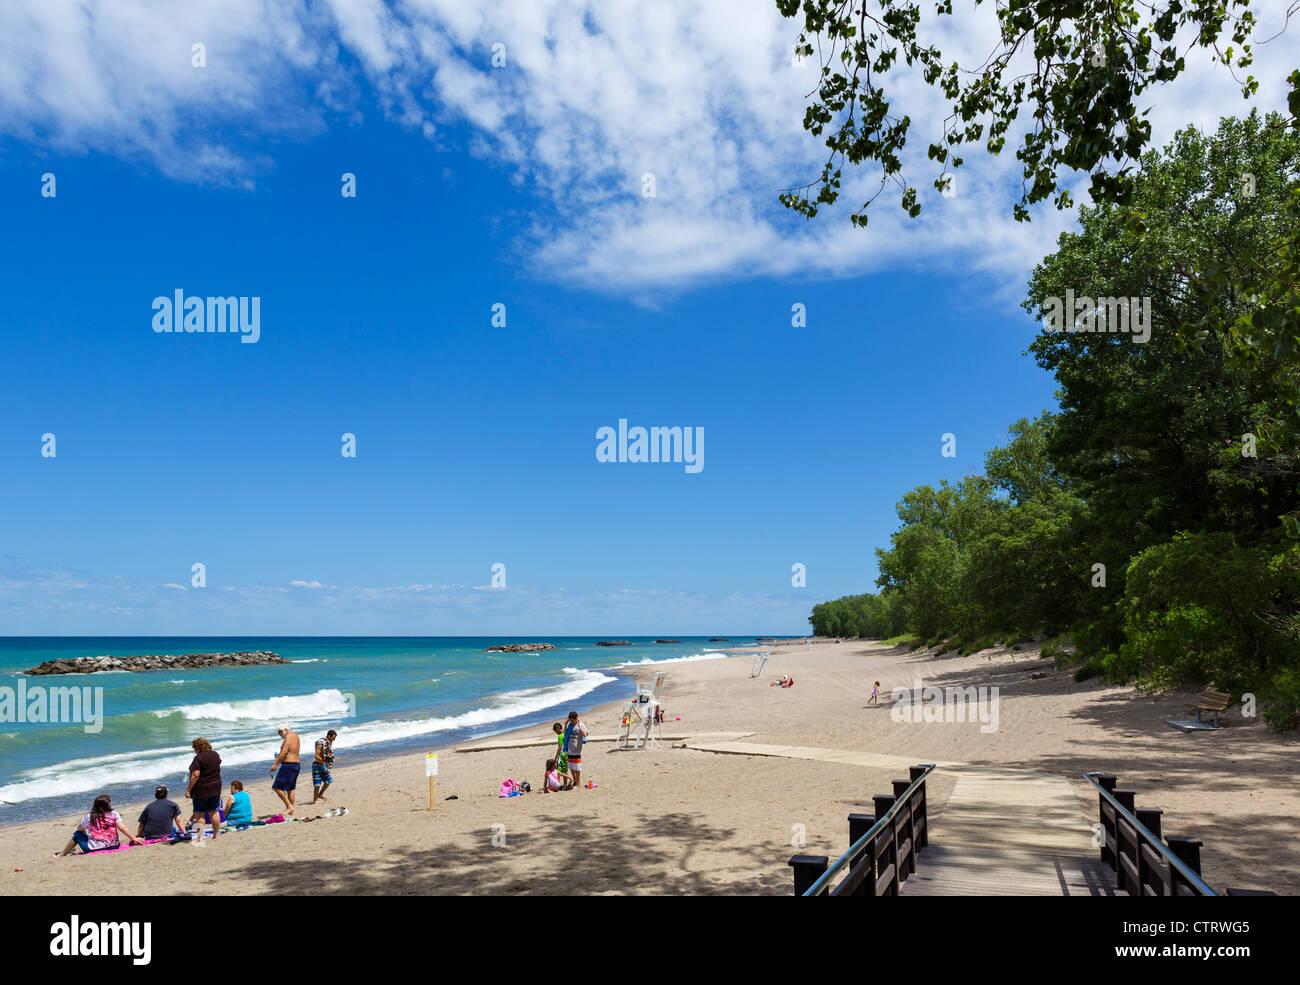 Beach No 7 in Presque Isle State Park, Lake Erie, Pennsylvania, USA - Stock Image